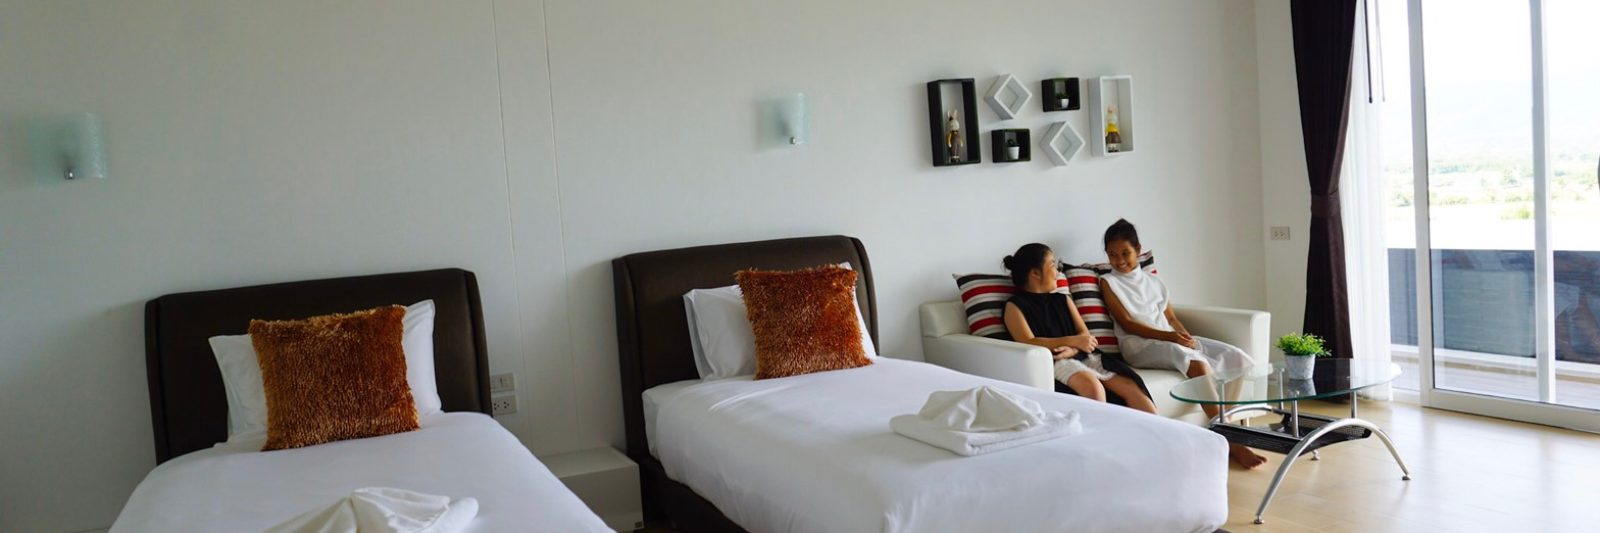 A2 Cviewhotel ซีวิวโฮเทล